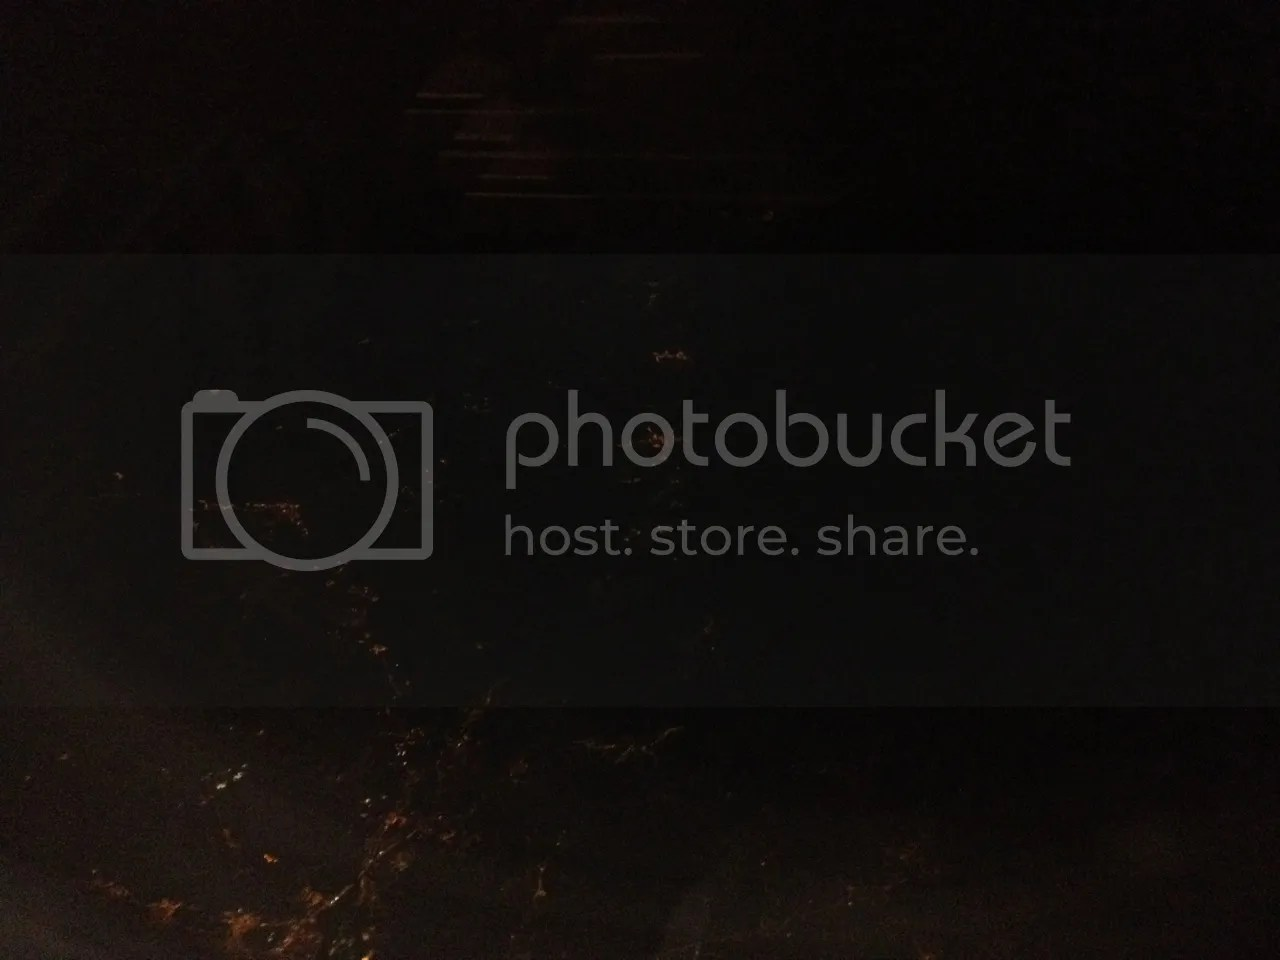 https://i1.wp.com/i181.photobucket.com/albums/x35/jwhite9185/Madrid/file-88.jpg